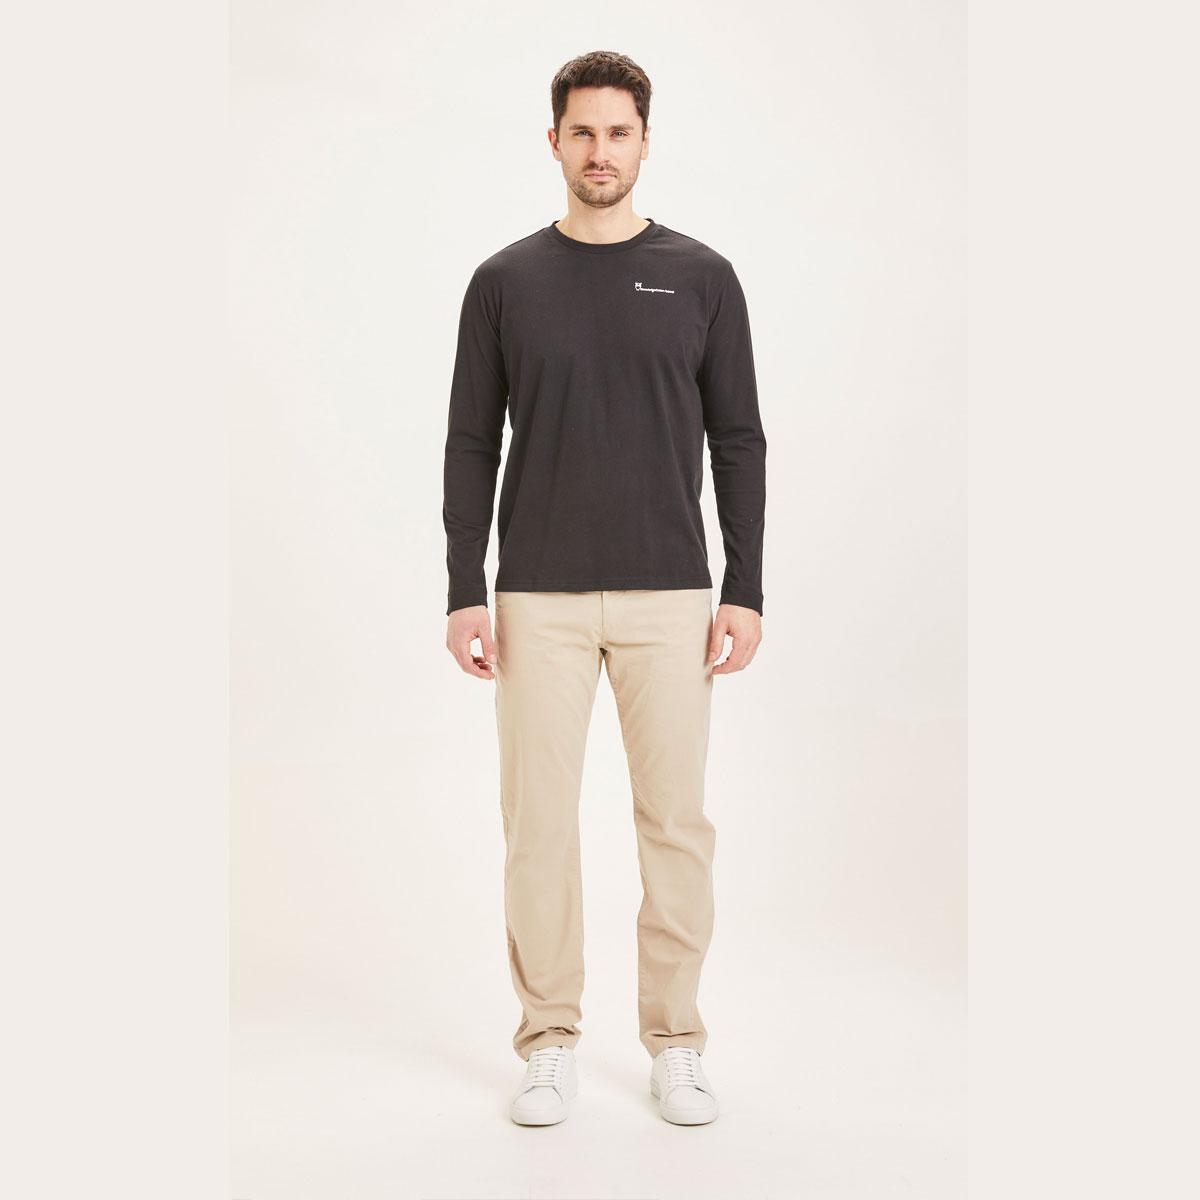 KNOWLEDGE Pantalon Chino poplin CHUCK regular Light feather gray